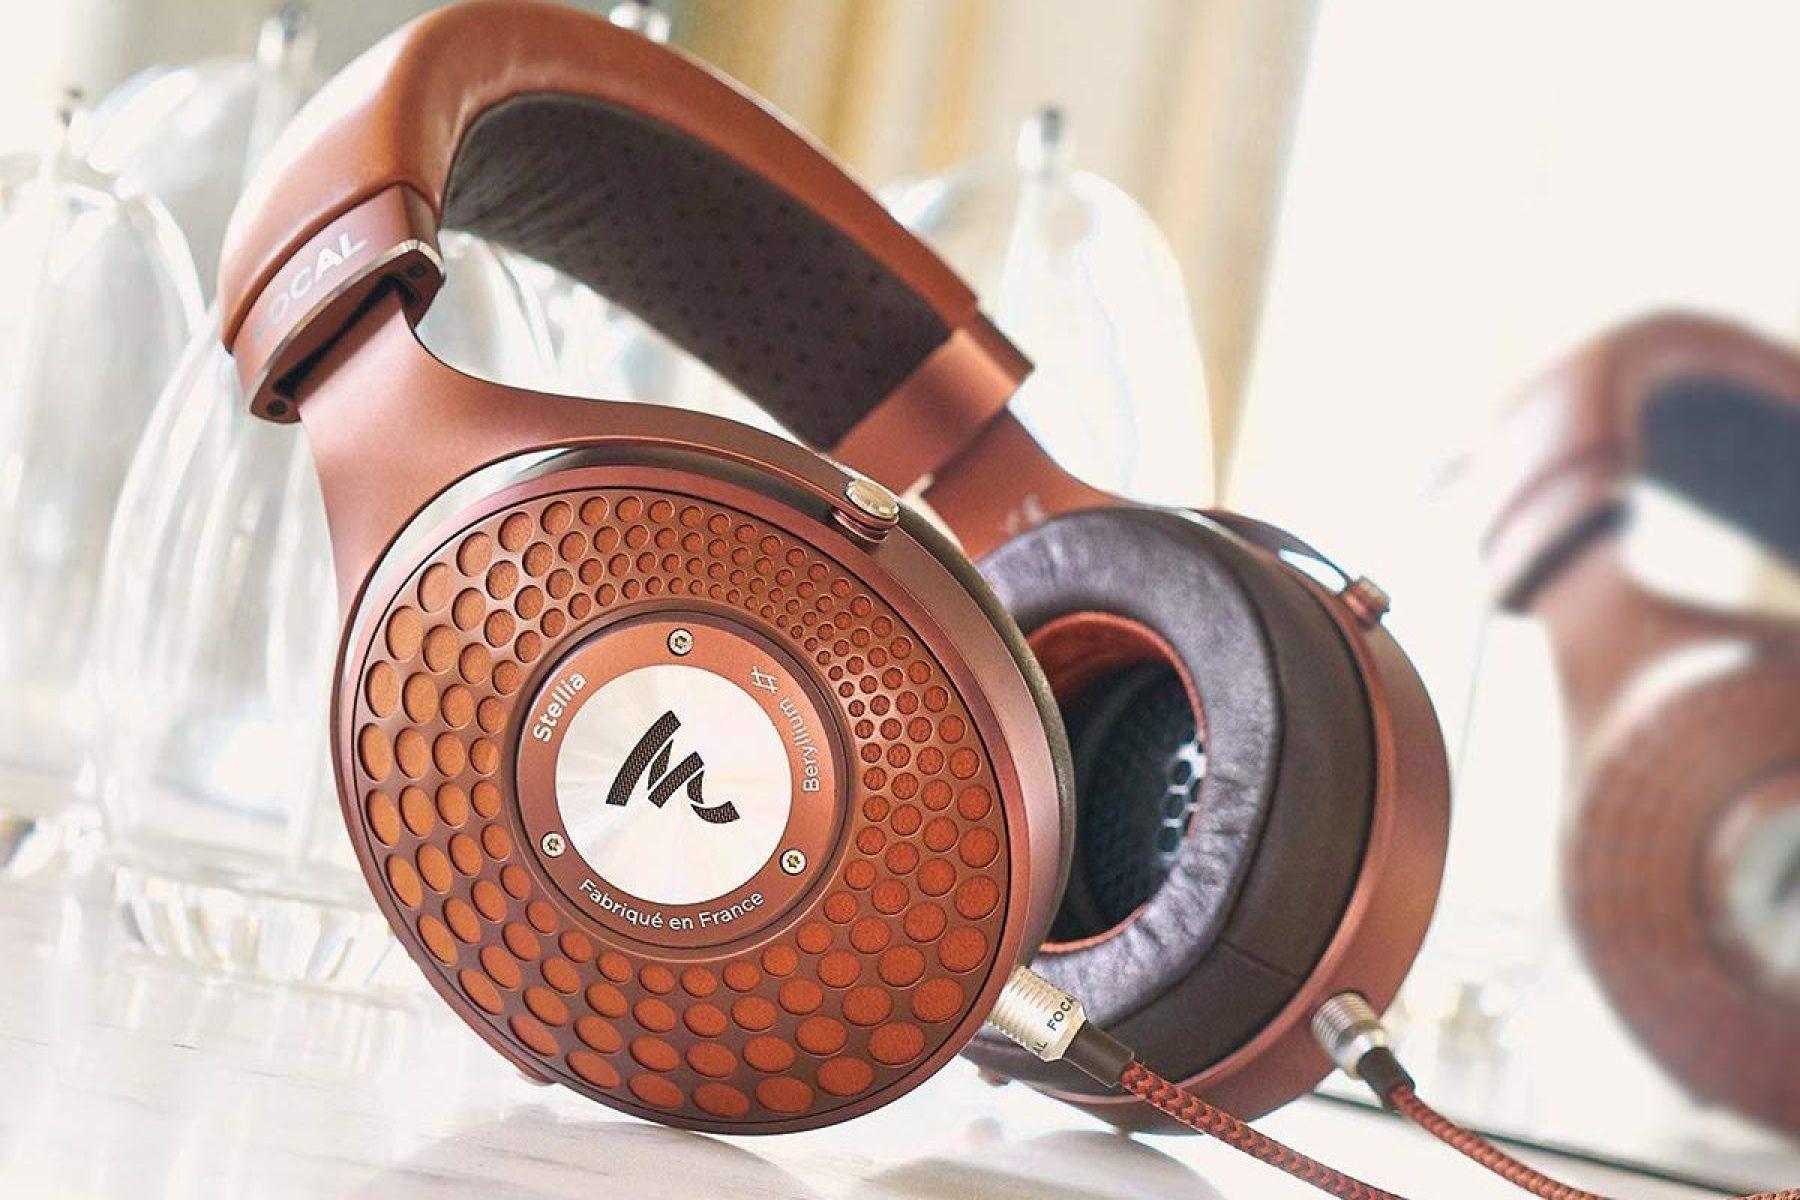 Best New Headphones 2020 Wireless Noise Canceling Headphone Earbuds Rolling Stone